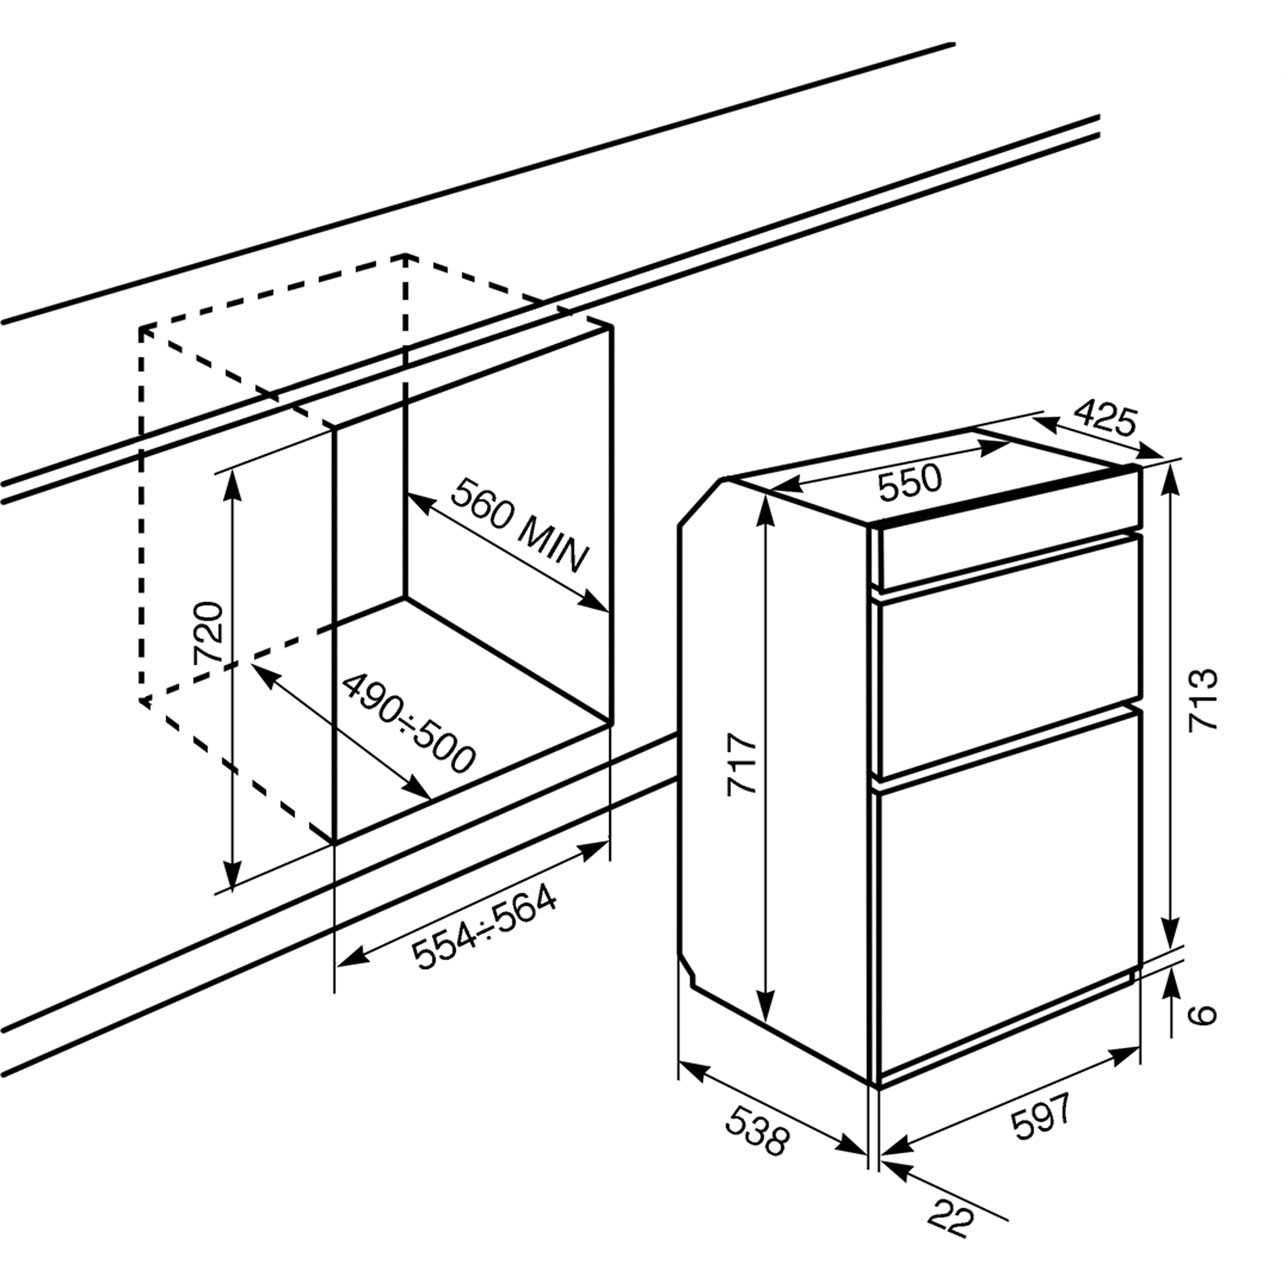 dusf44x_ss_smeg_doubleoven_dim_l?resize=665%2C664 smeg range cooker wiring diagram the best wiring diagram 2017 cooker socket wiring diagram at webbmarketing.co